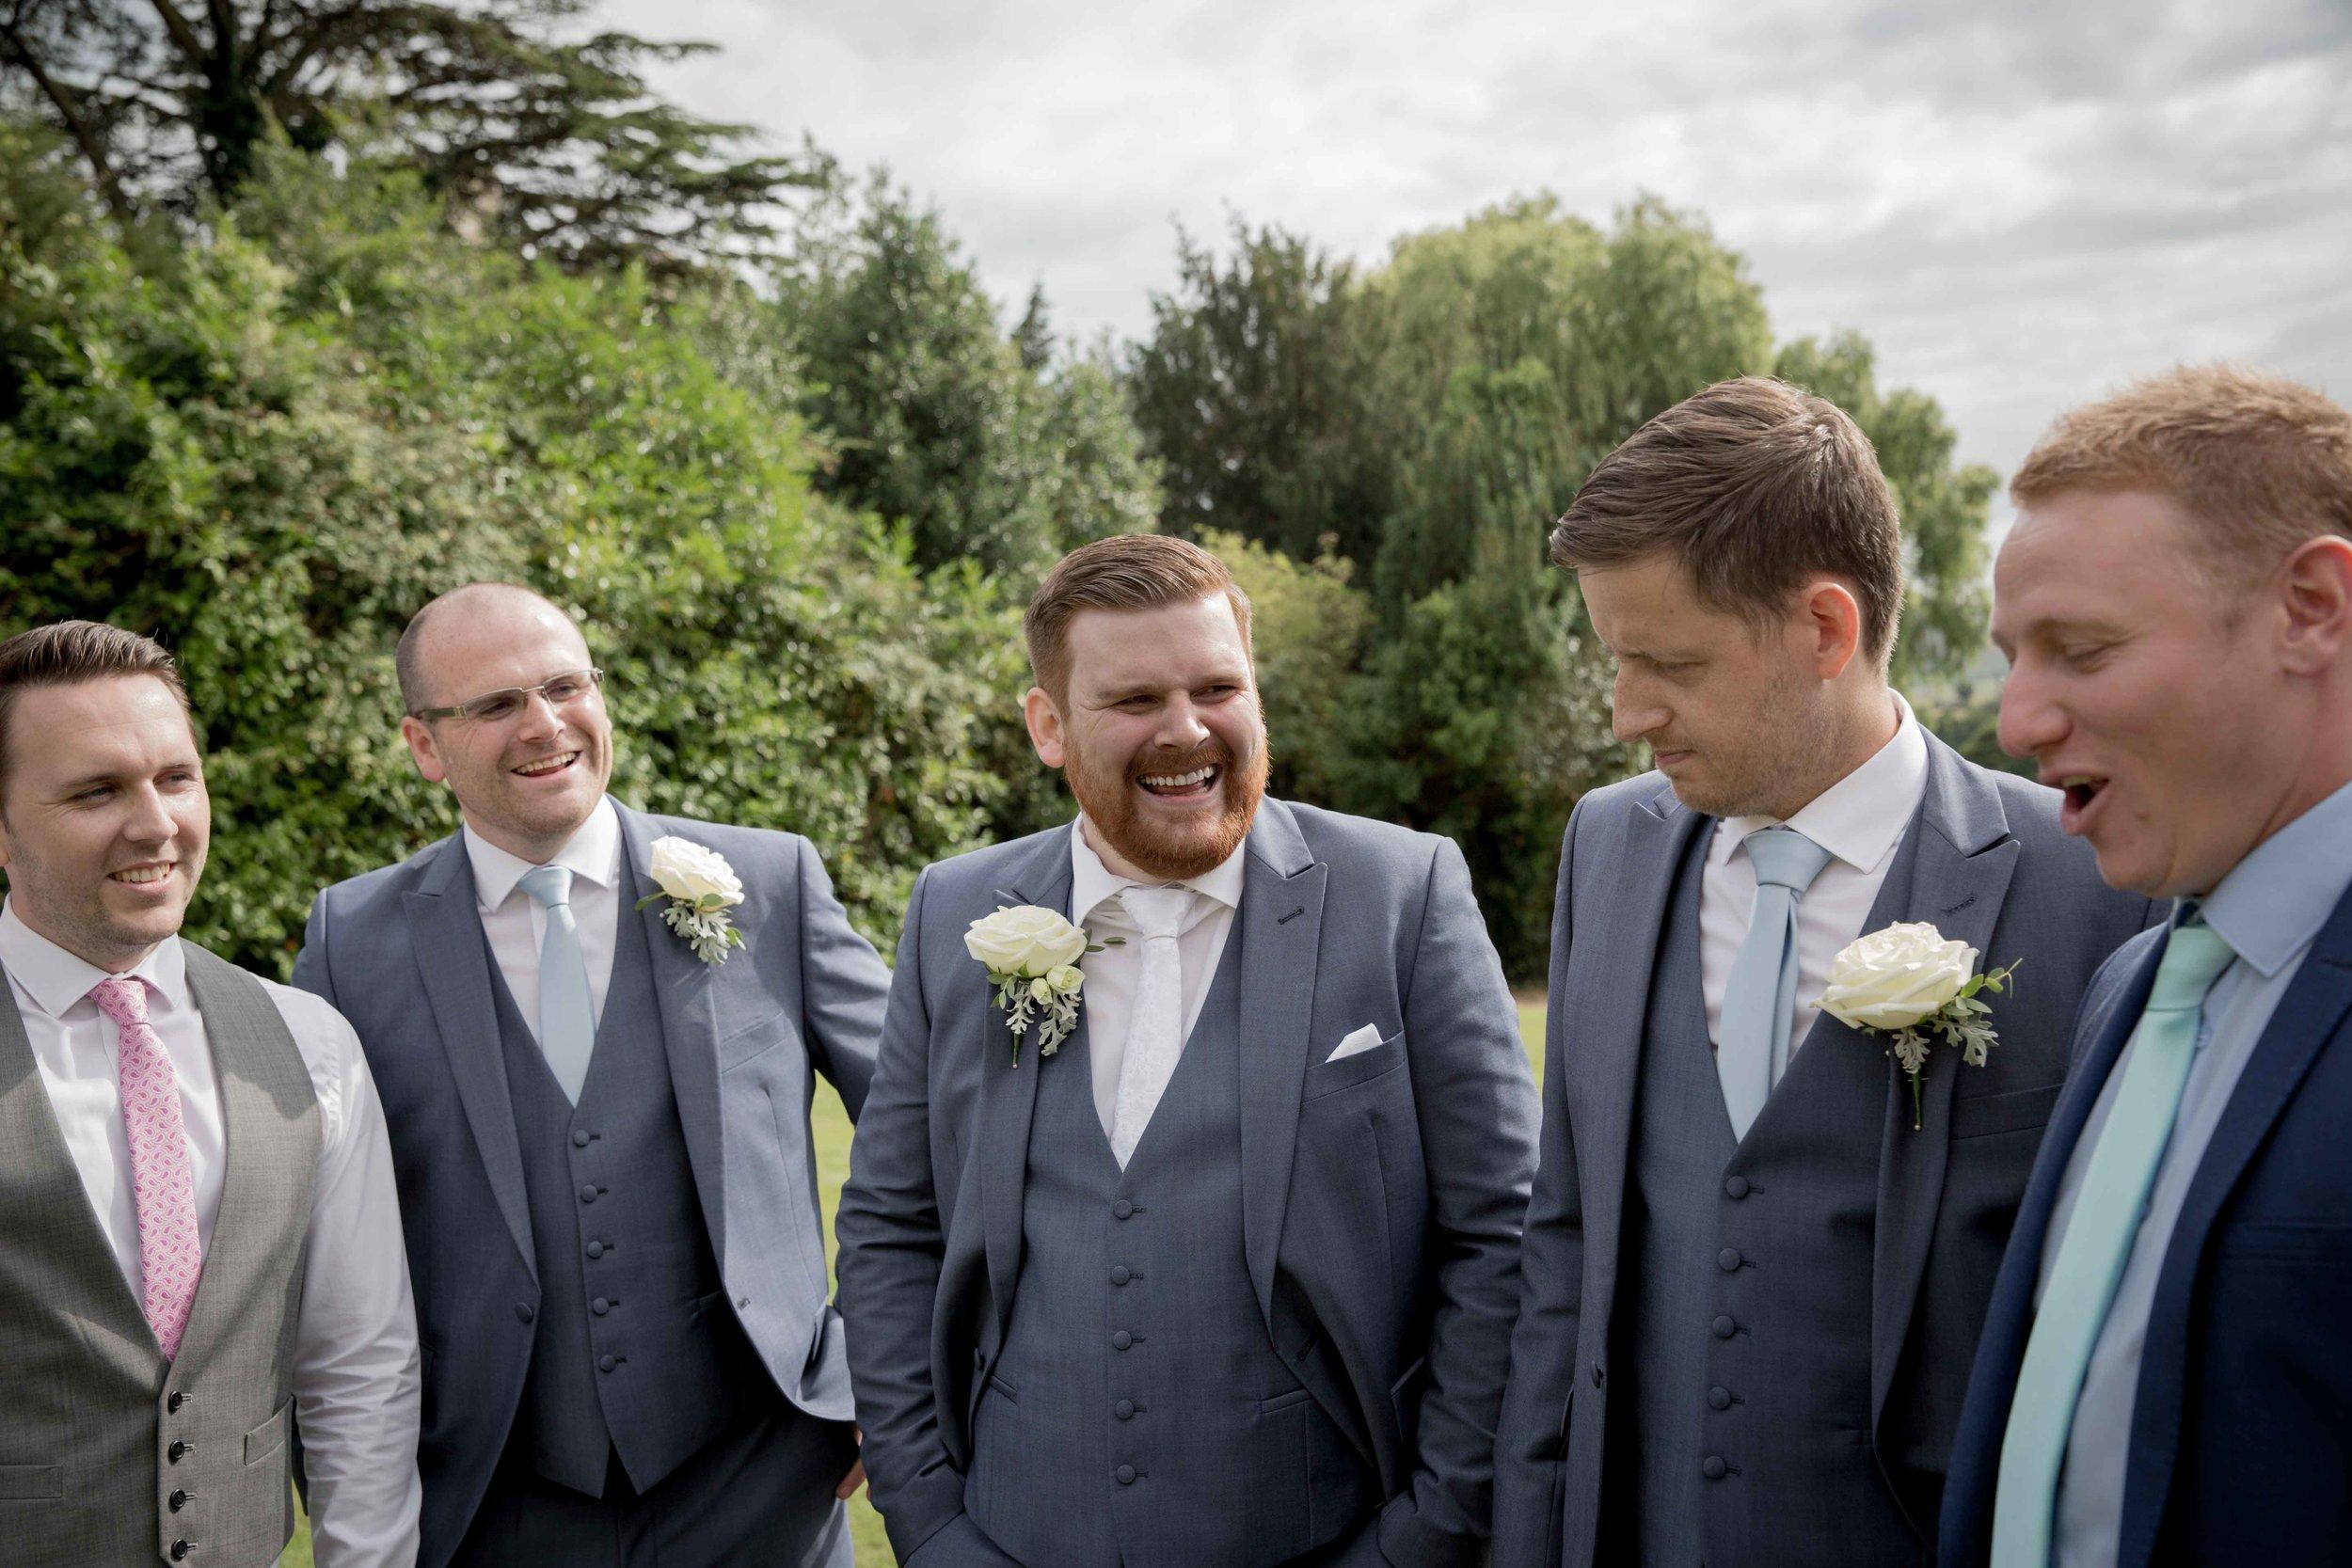 cotswold-wedding-photography-at-stonehouse-court-hotel-natalia-smith-photography-gloucestershire-wedding-photographer-59.jpg